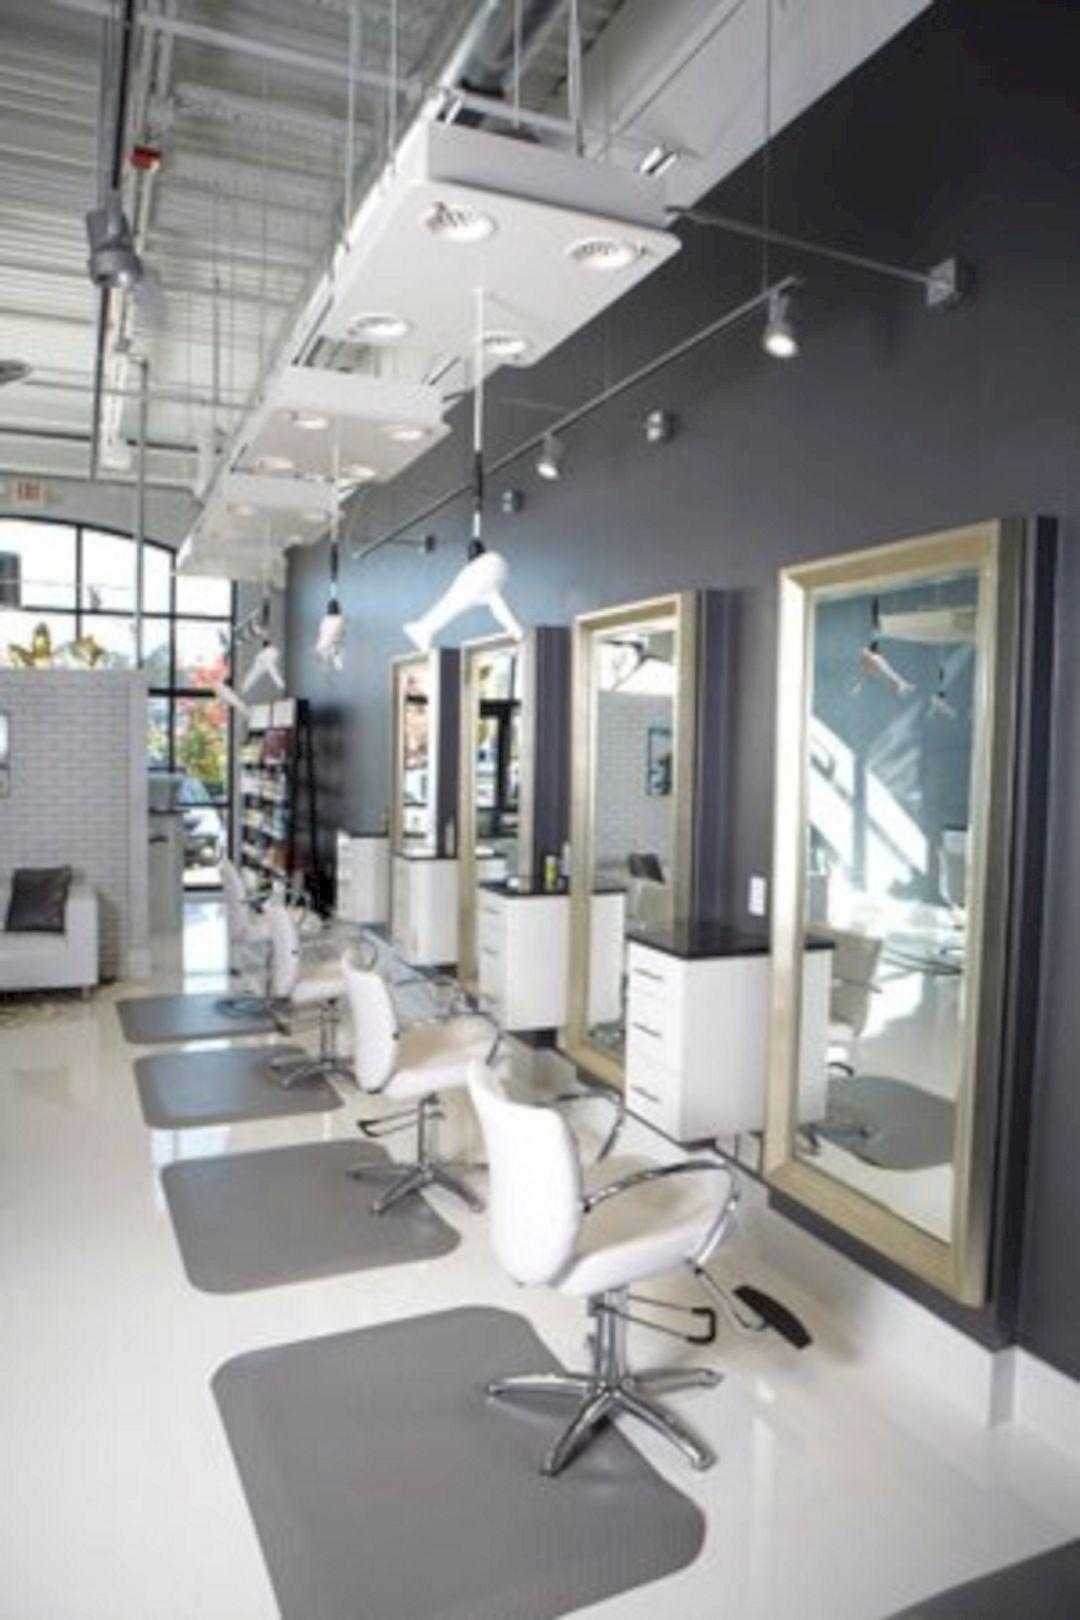 Freshouzcom Private Salon Decor Ideas Best Home Your For On46 Best Home Salon Decor Id Salon Dekoration Friseursalon Inneneinrichtung Salon Zu Hause